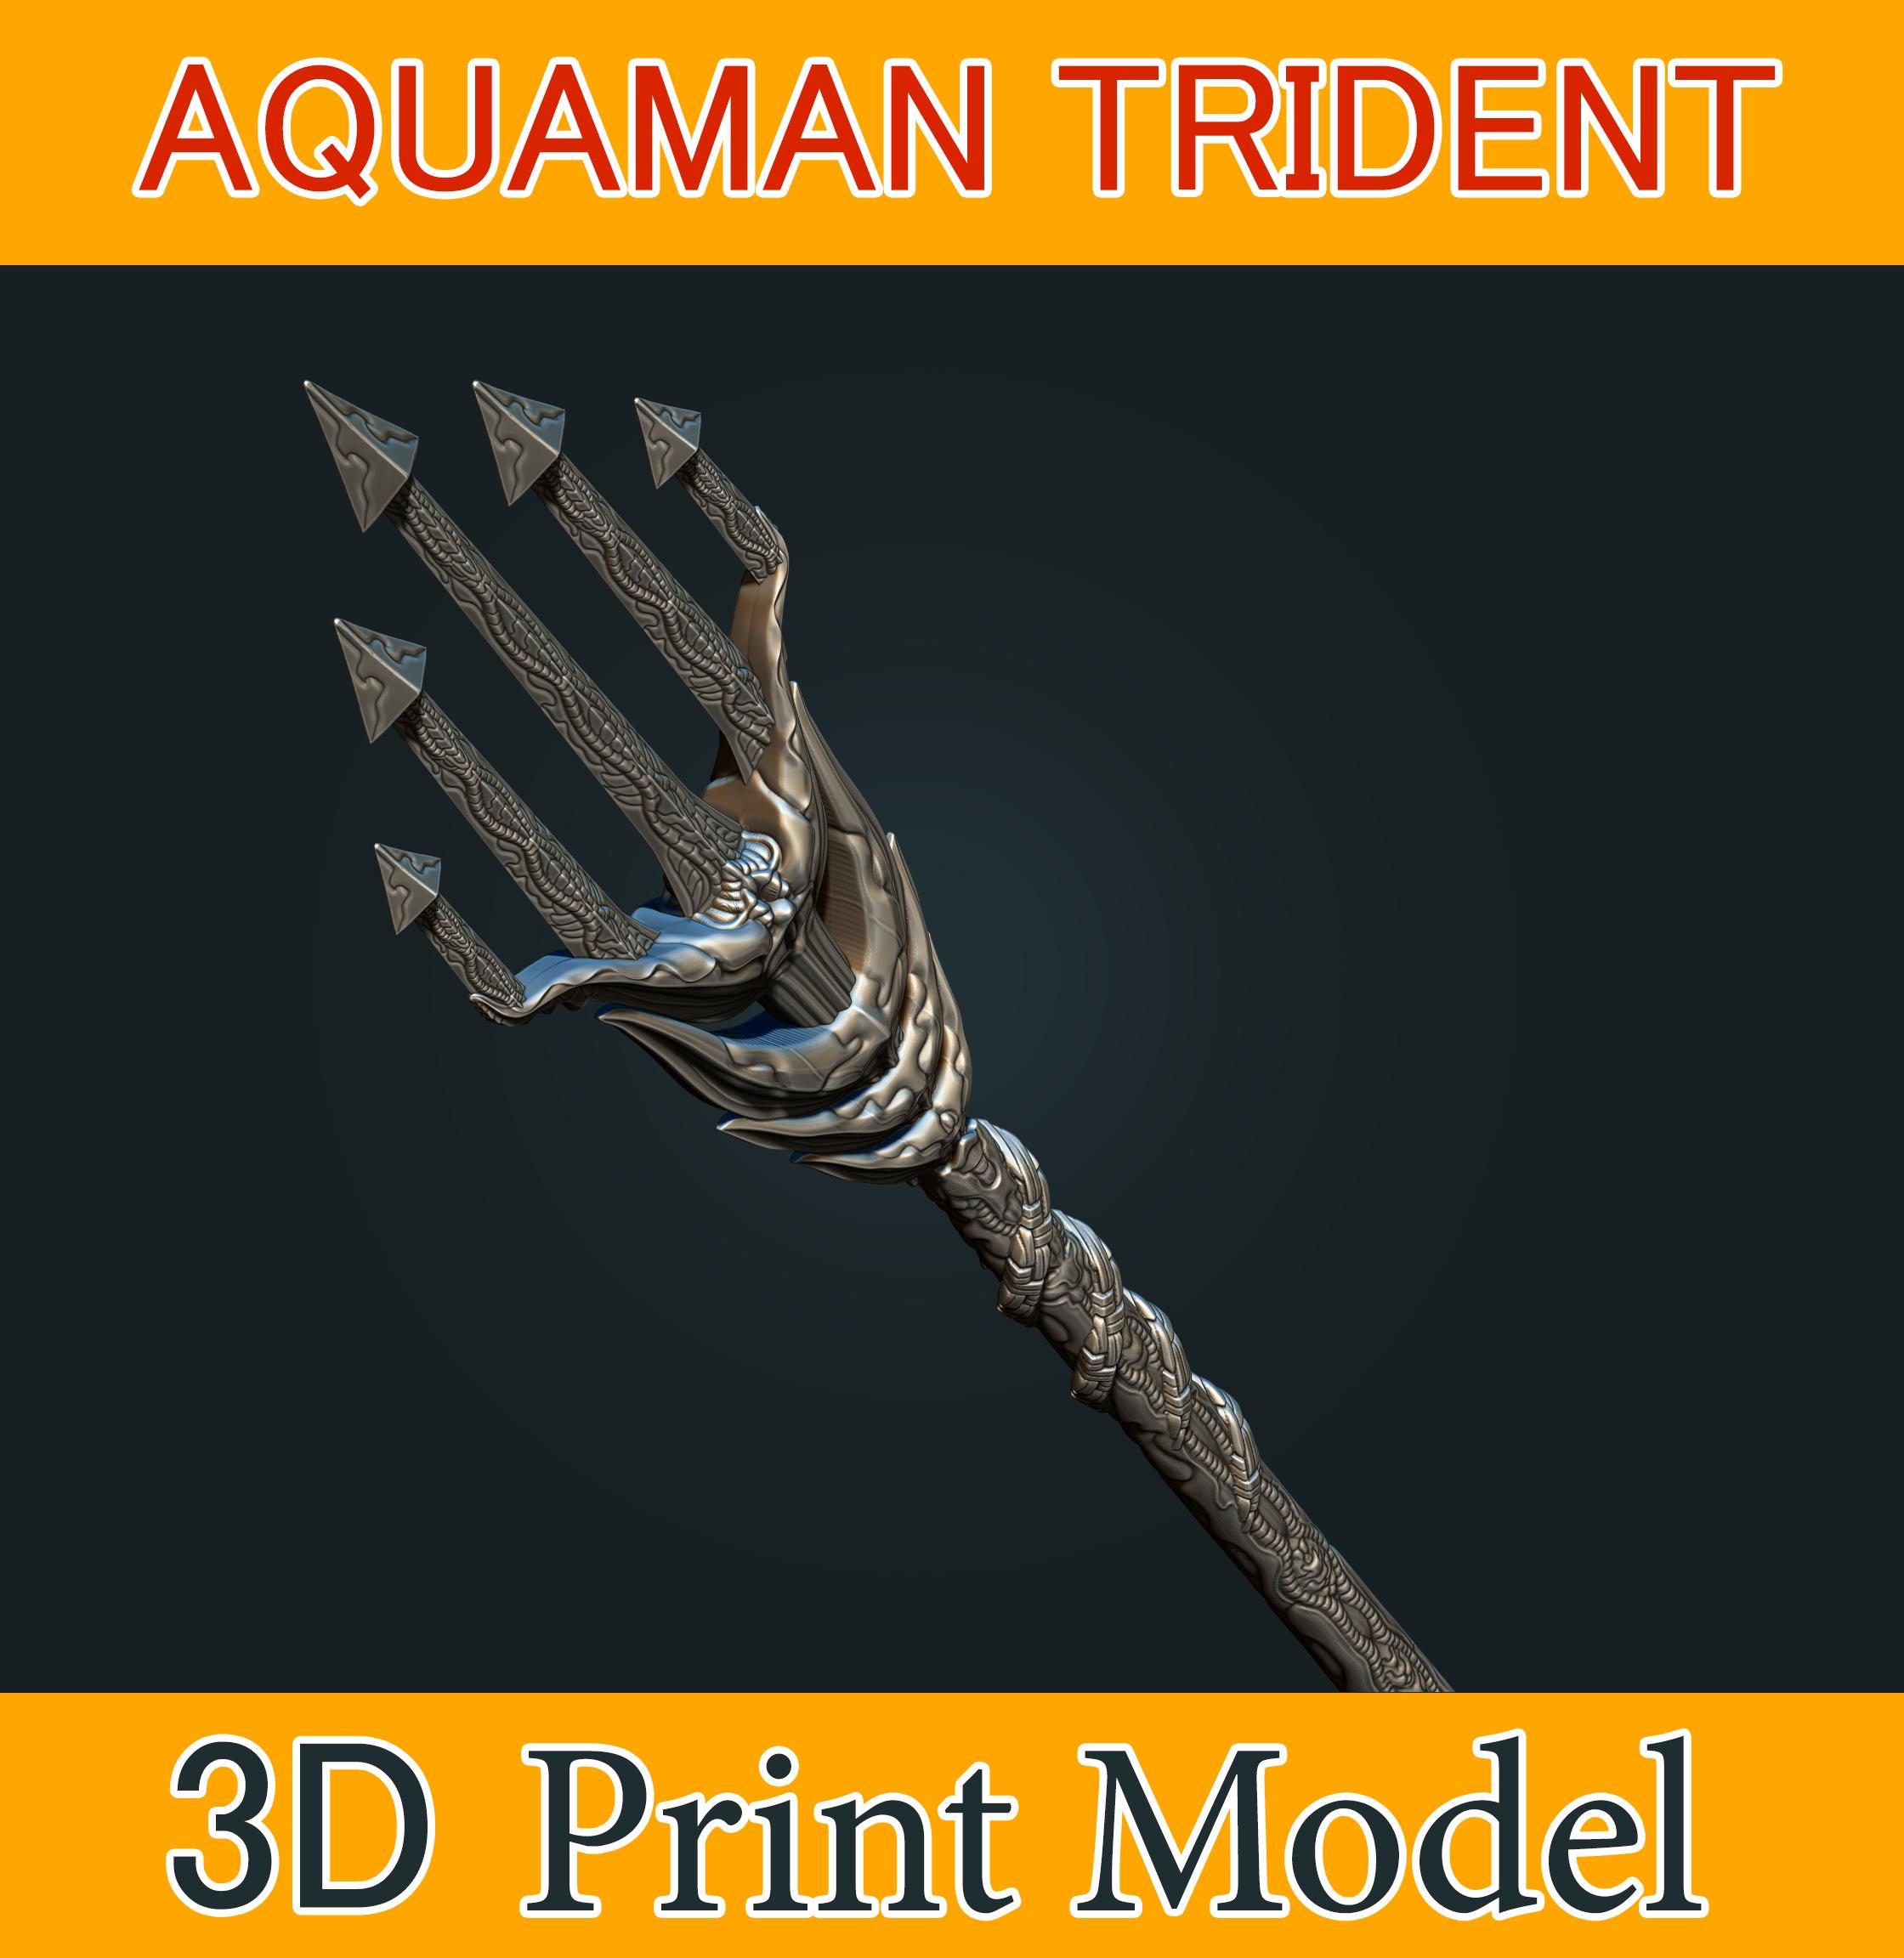 aquaman_weapon_stl_05b.png Download STL file Aquaman Trident Cosplay STL files - Costume Weapons 3D Printing • 3D printing design, 3DPrintModelStoreSS